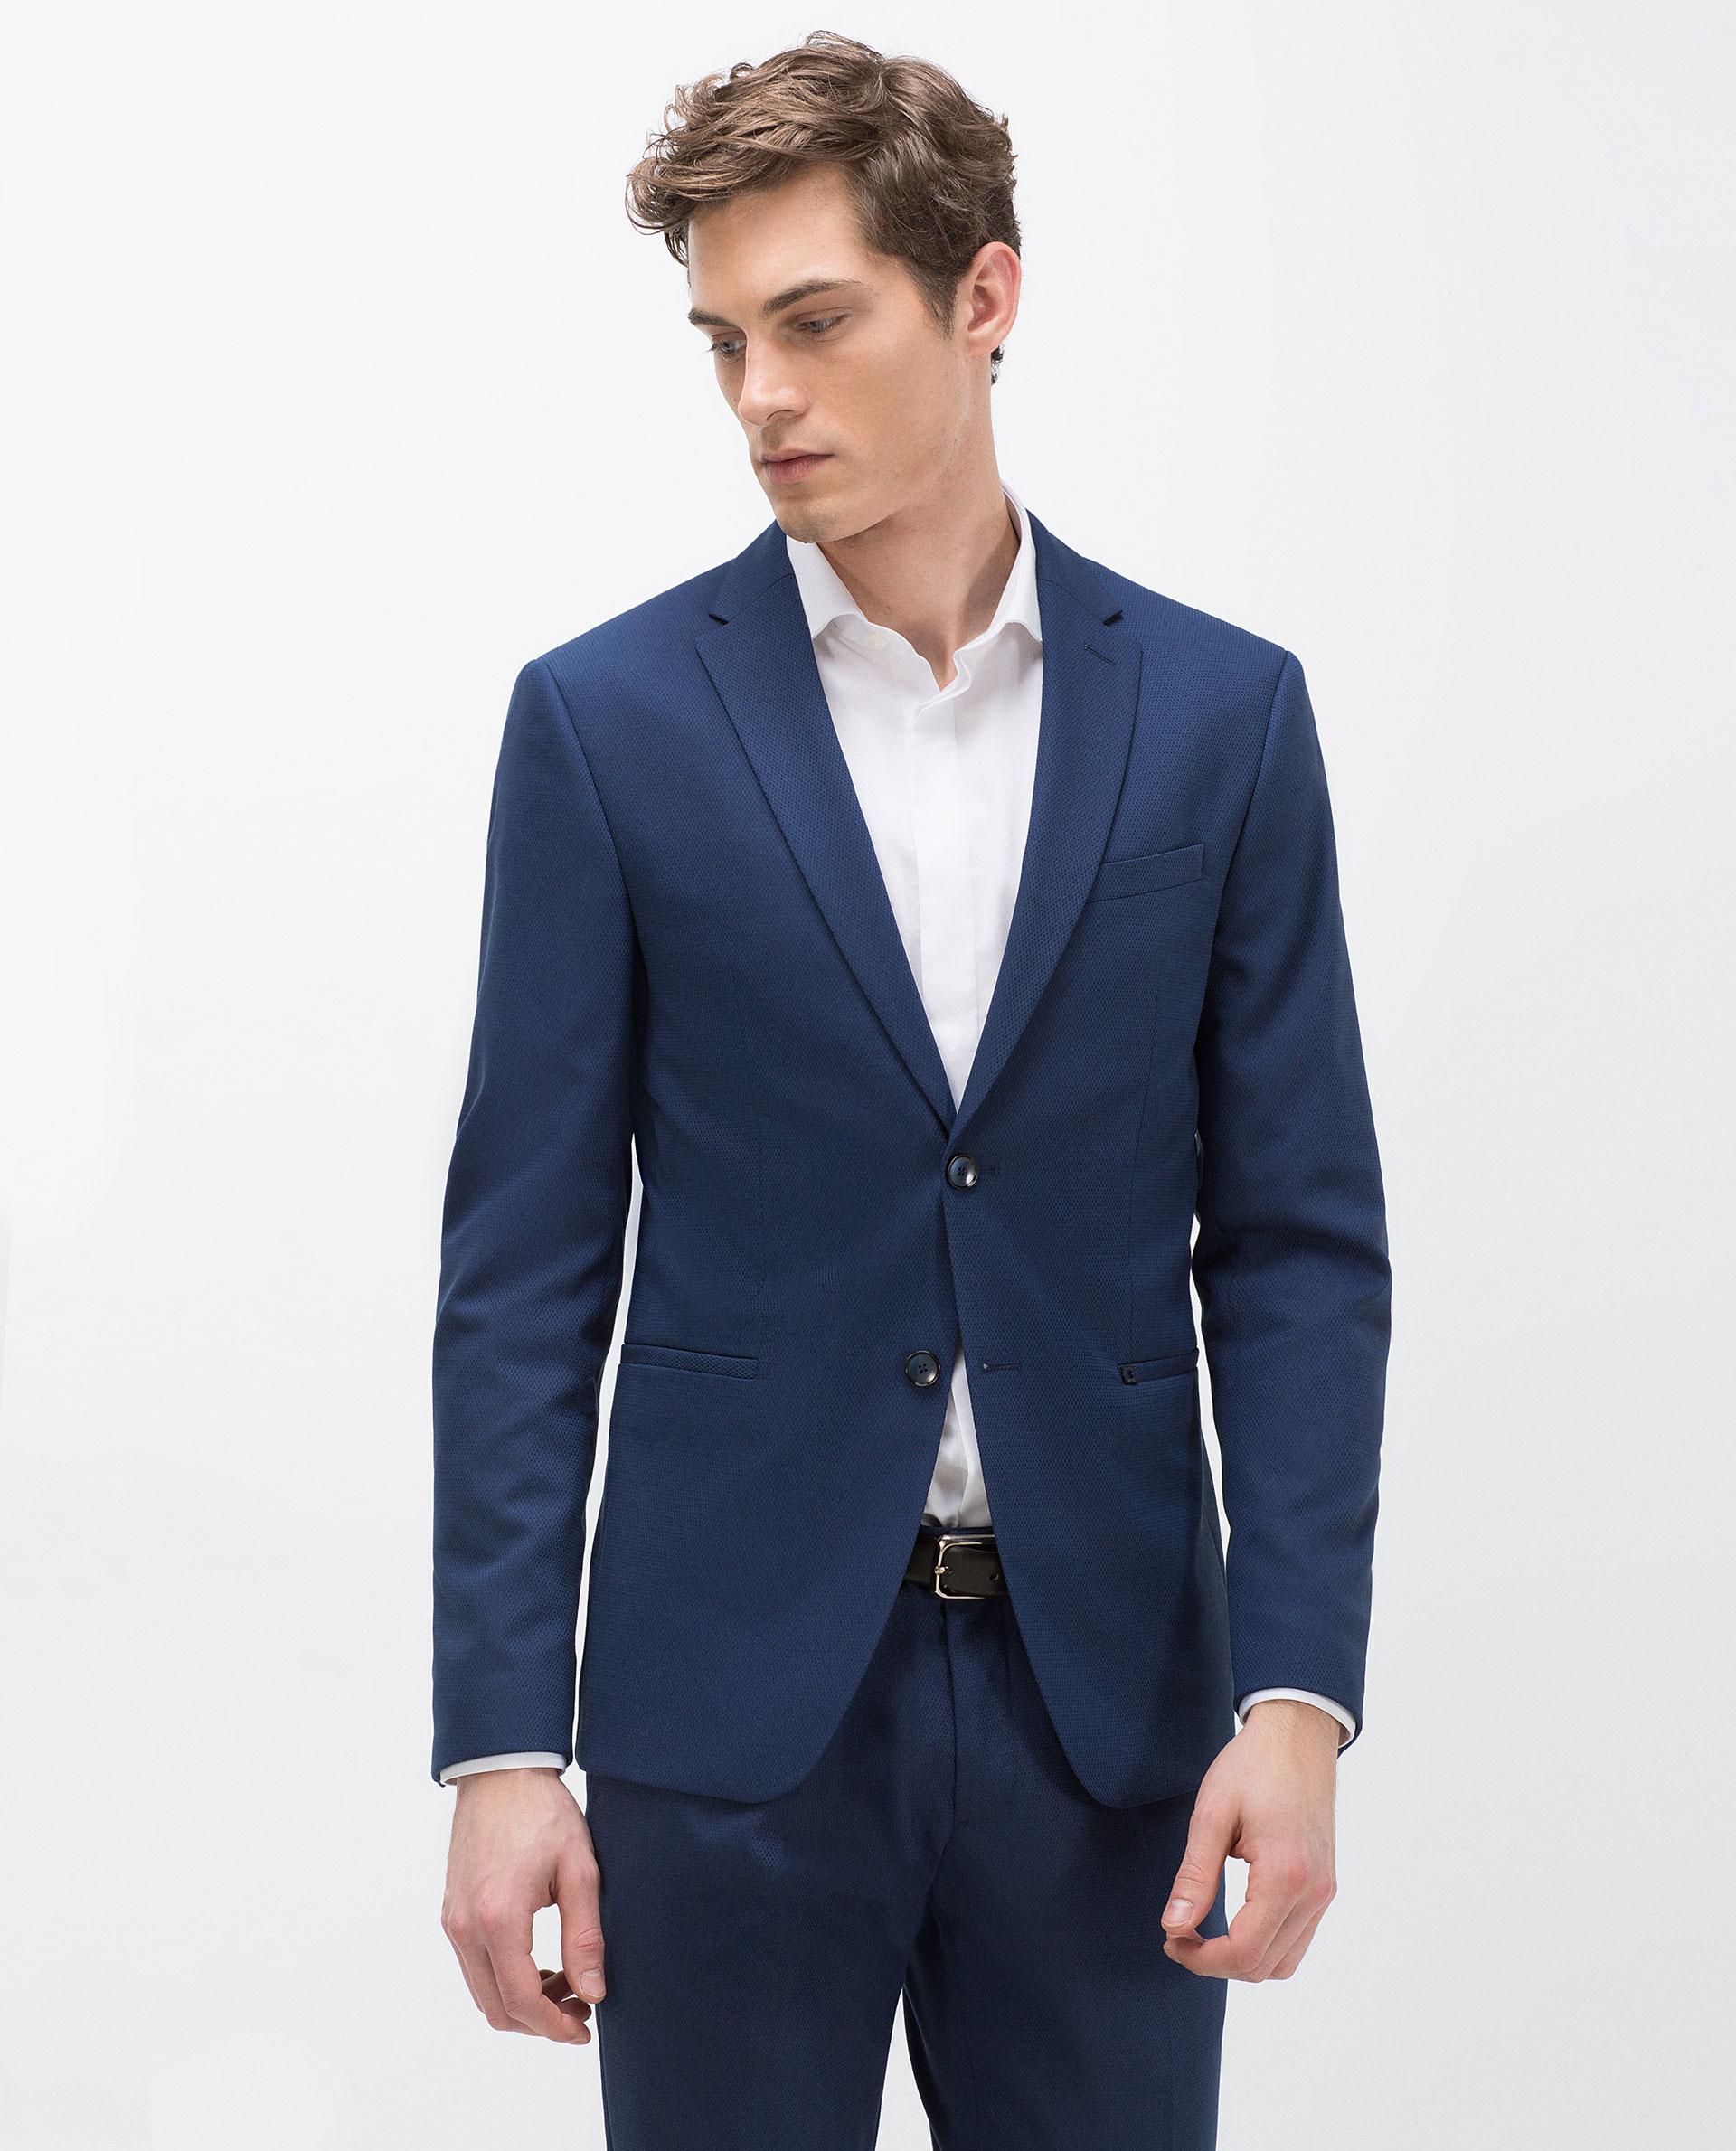 Zara Textured Weave Suit Blazer in Blue for Men